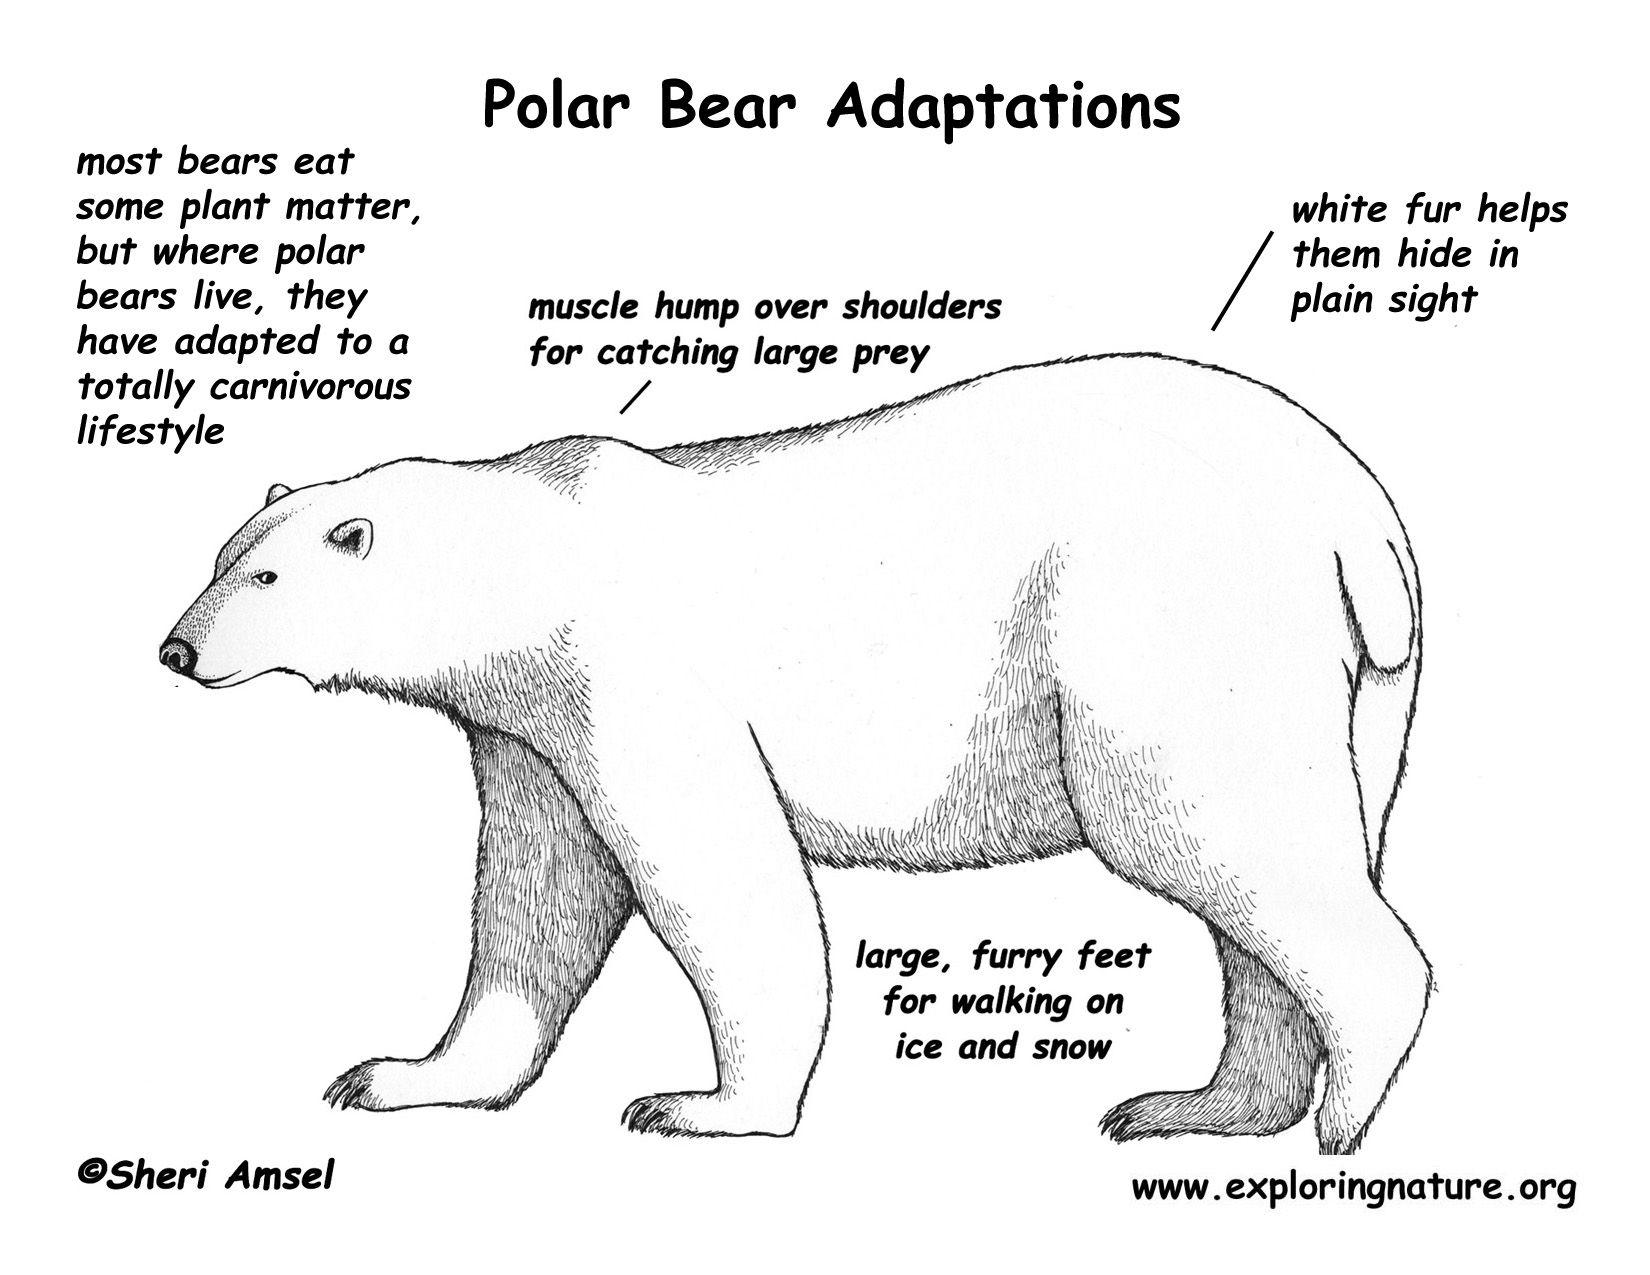 3c7fc89ec152c438c224801e82e5e473 polar bear diagram wiring diagram all data